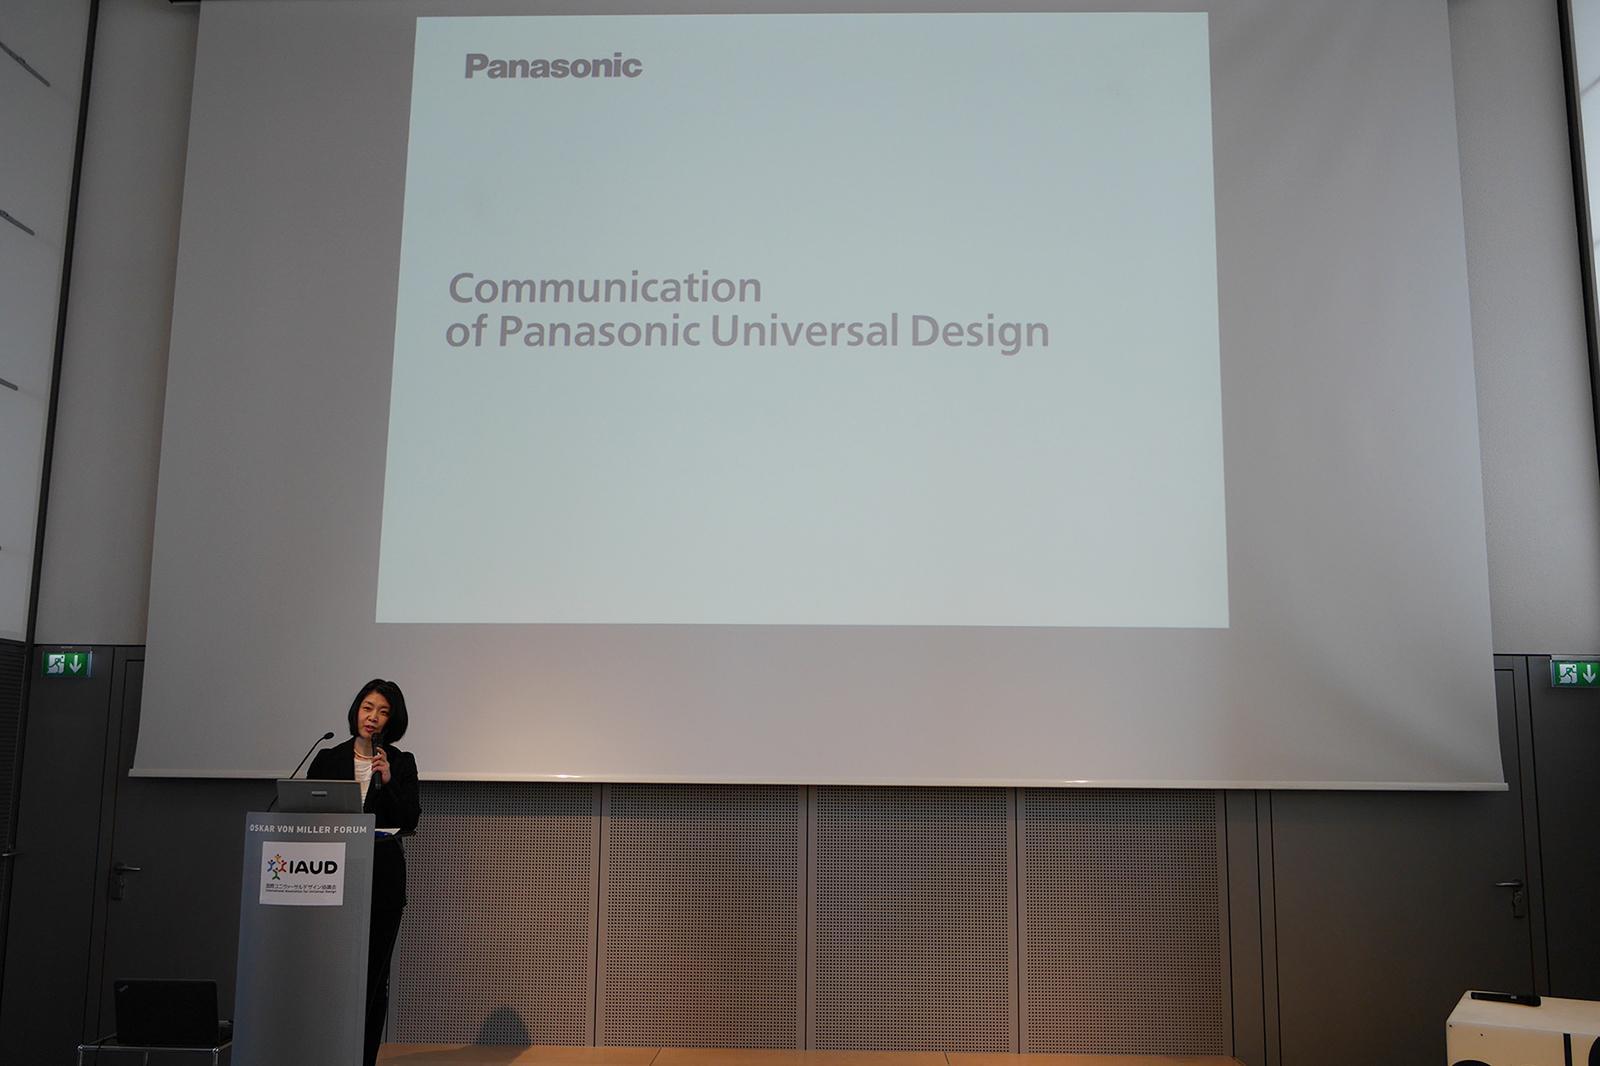 photo: Panasonic wins Grand Award at IAUD Award 2017